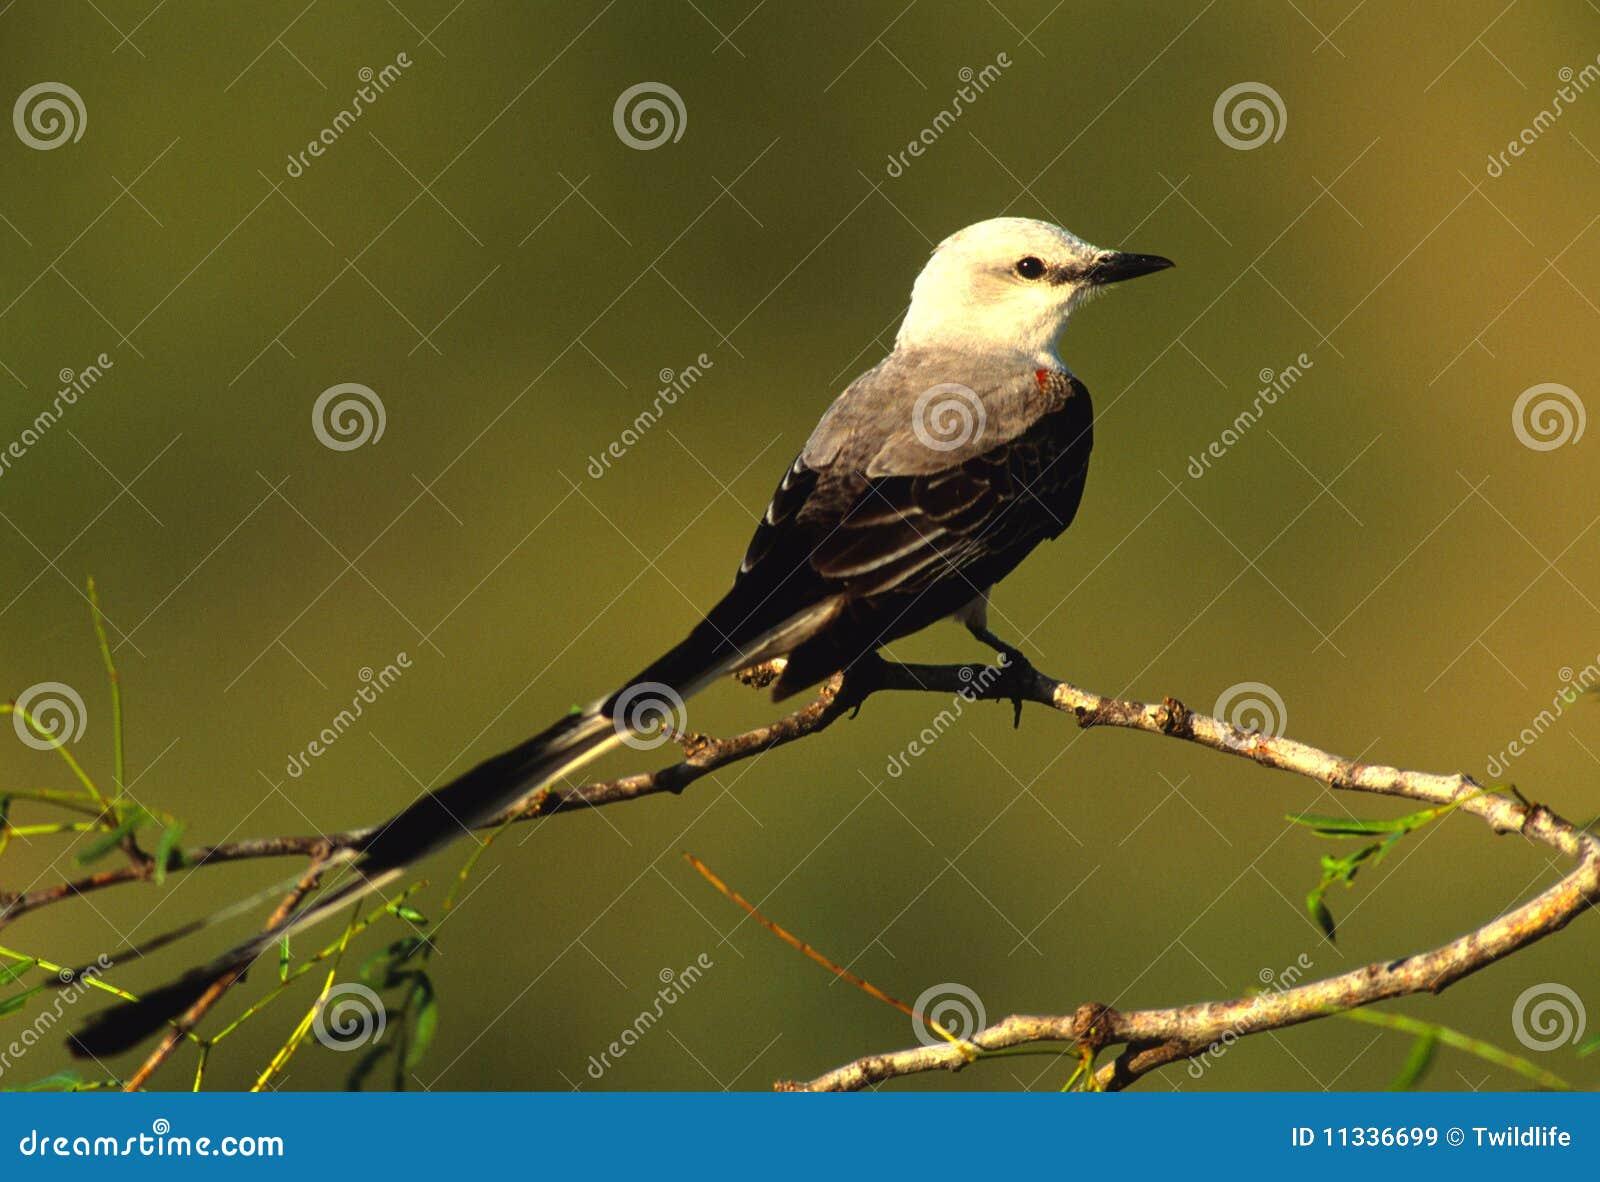 Scissor tailed flycatcher clipart - photo#23